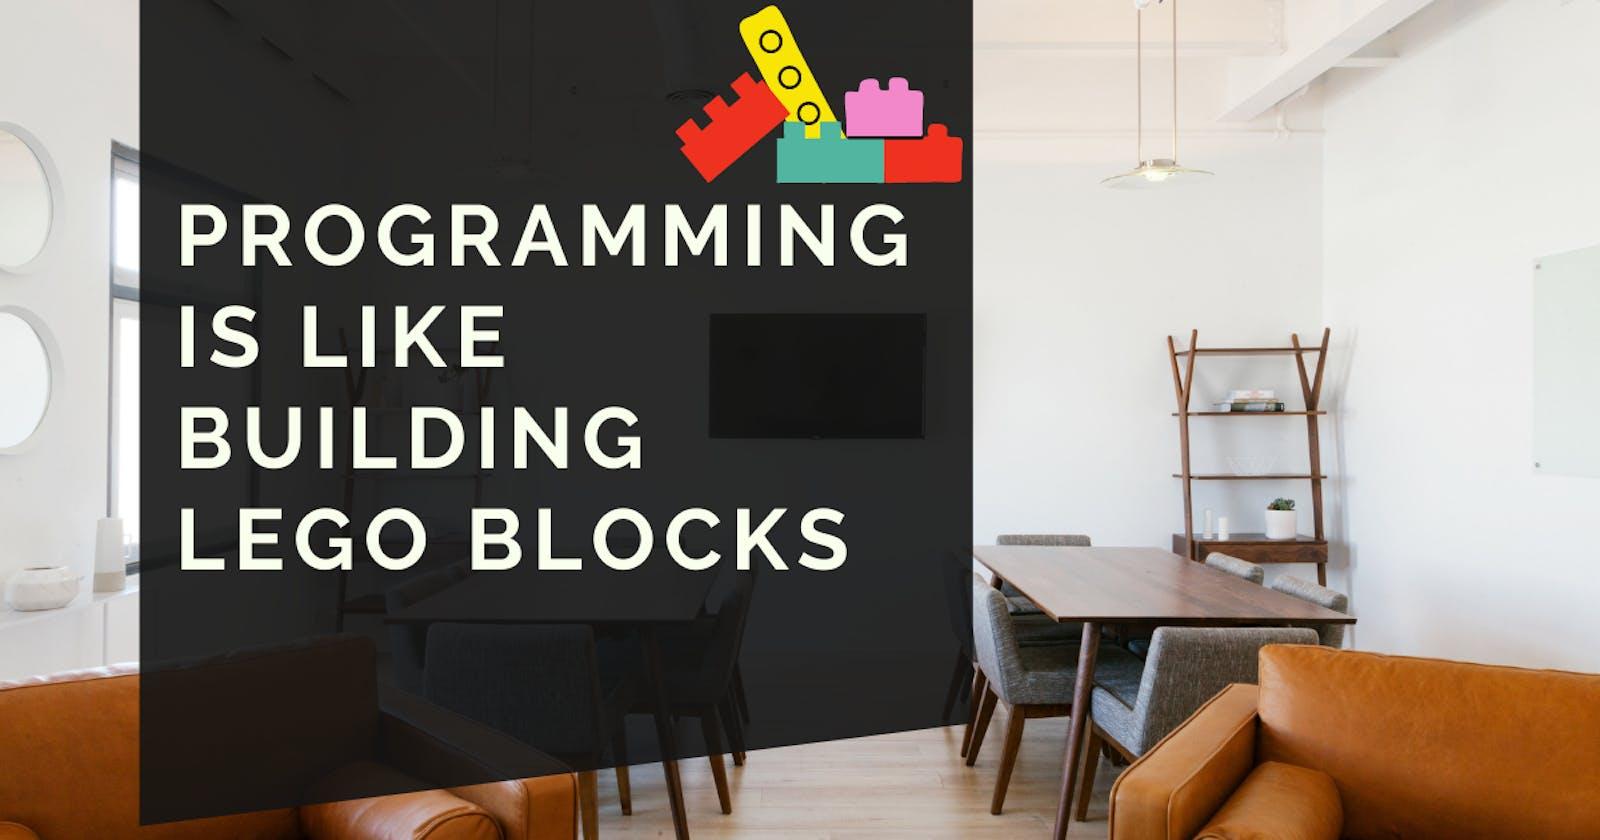 Programming is like building Lego blocks